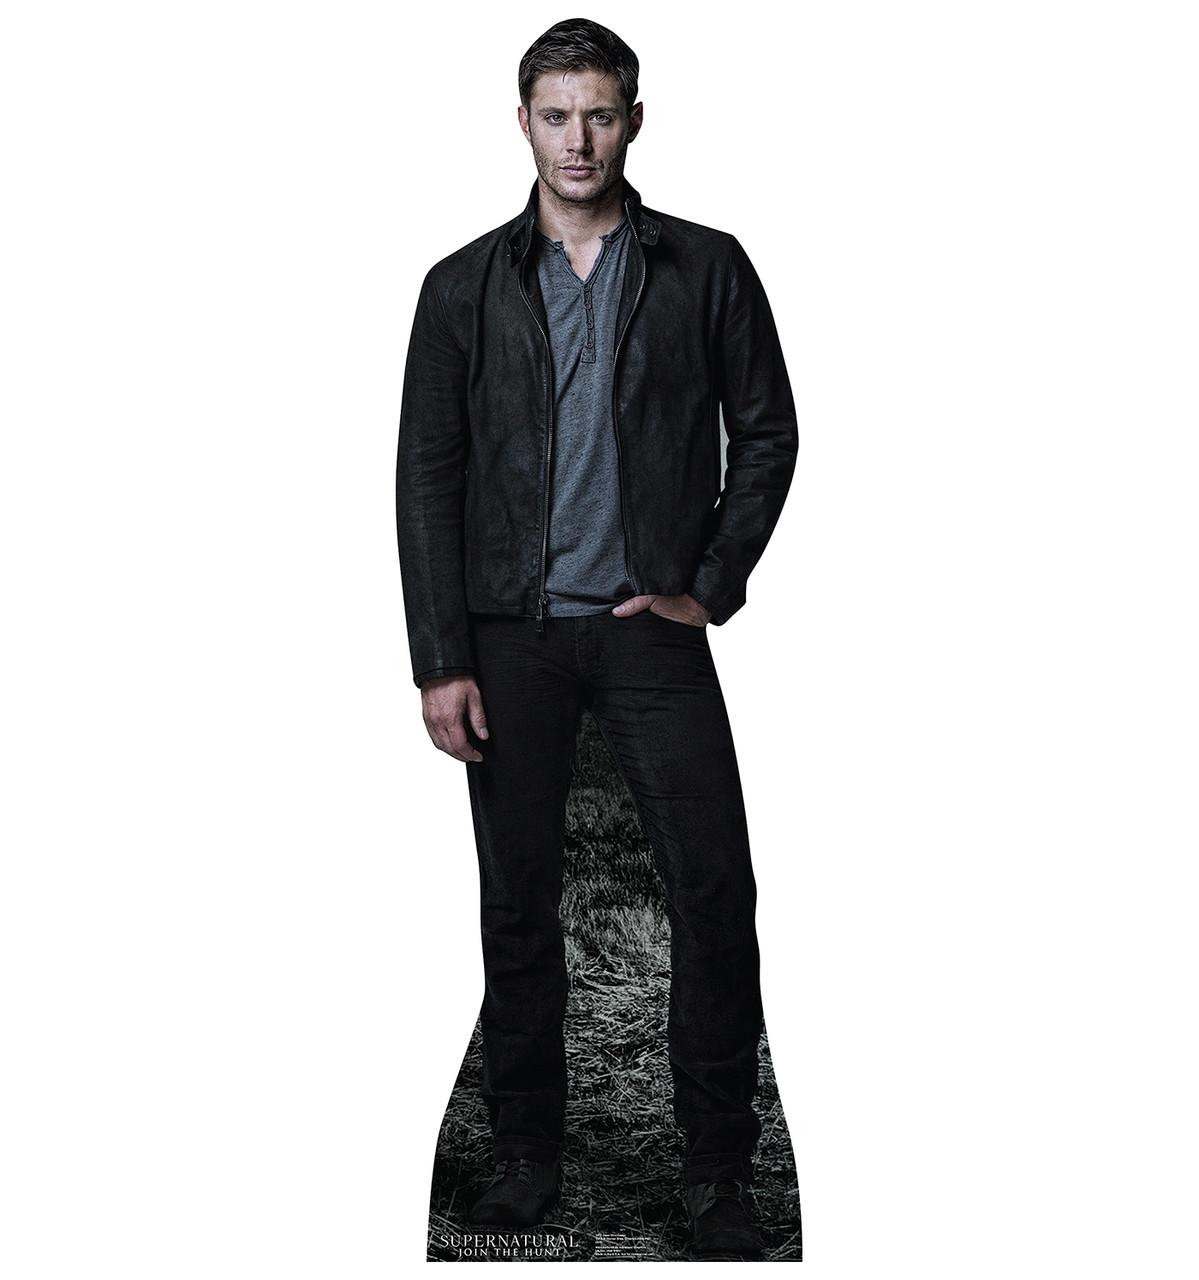 Life-size Dean Winchester - Supernatural 1 Cardboard Standup | Cardboard Cutout